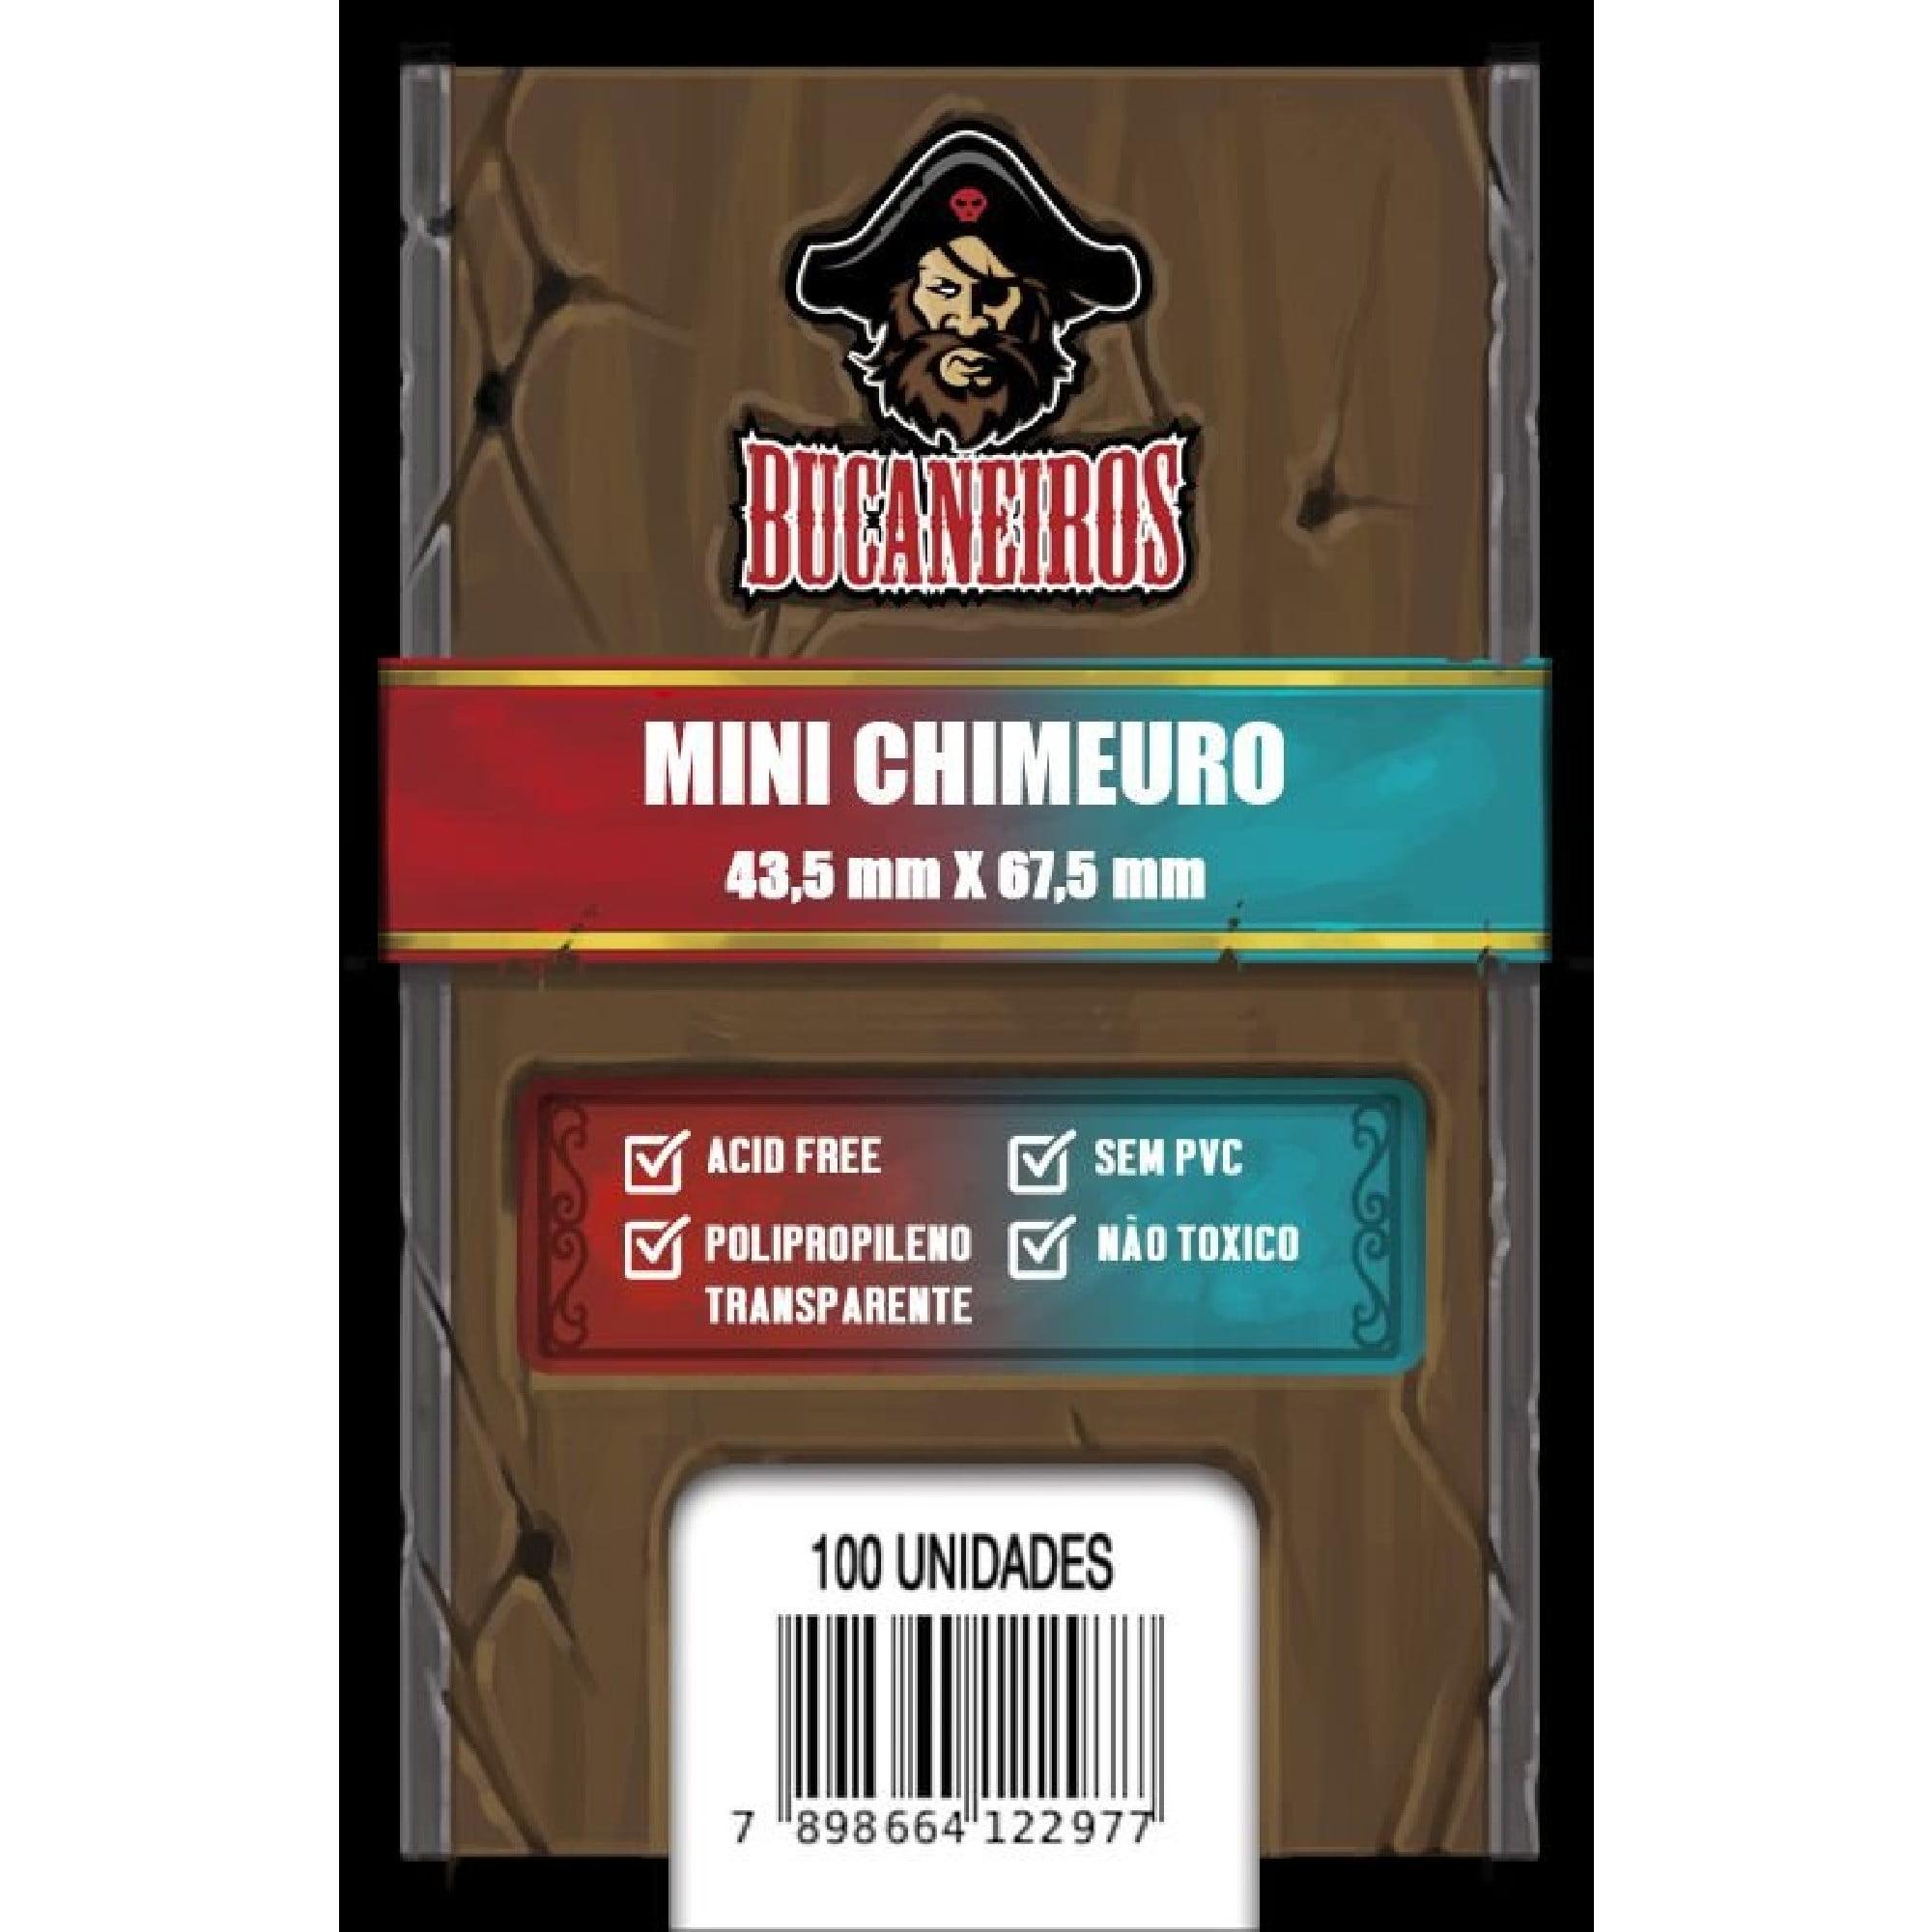 Sleeves Mini Chimeuro (43,5 x 67,5mm) Bucaneiros